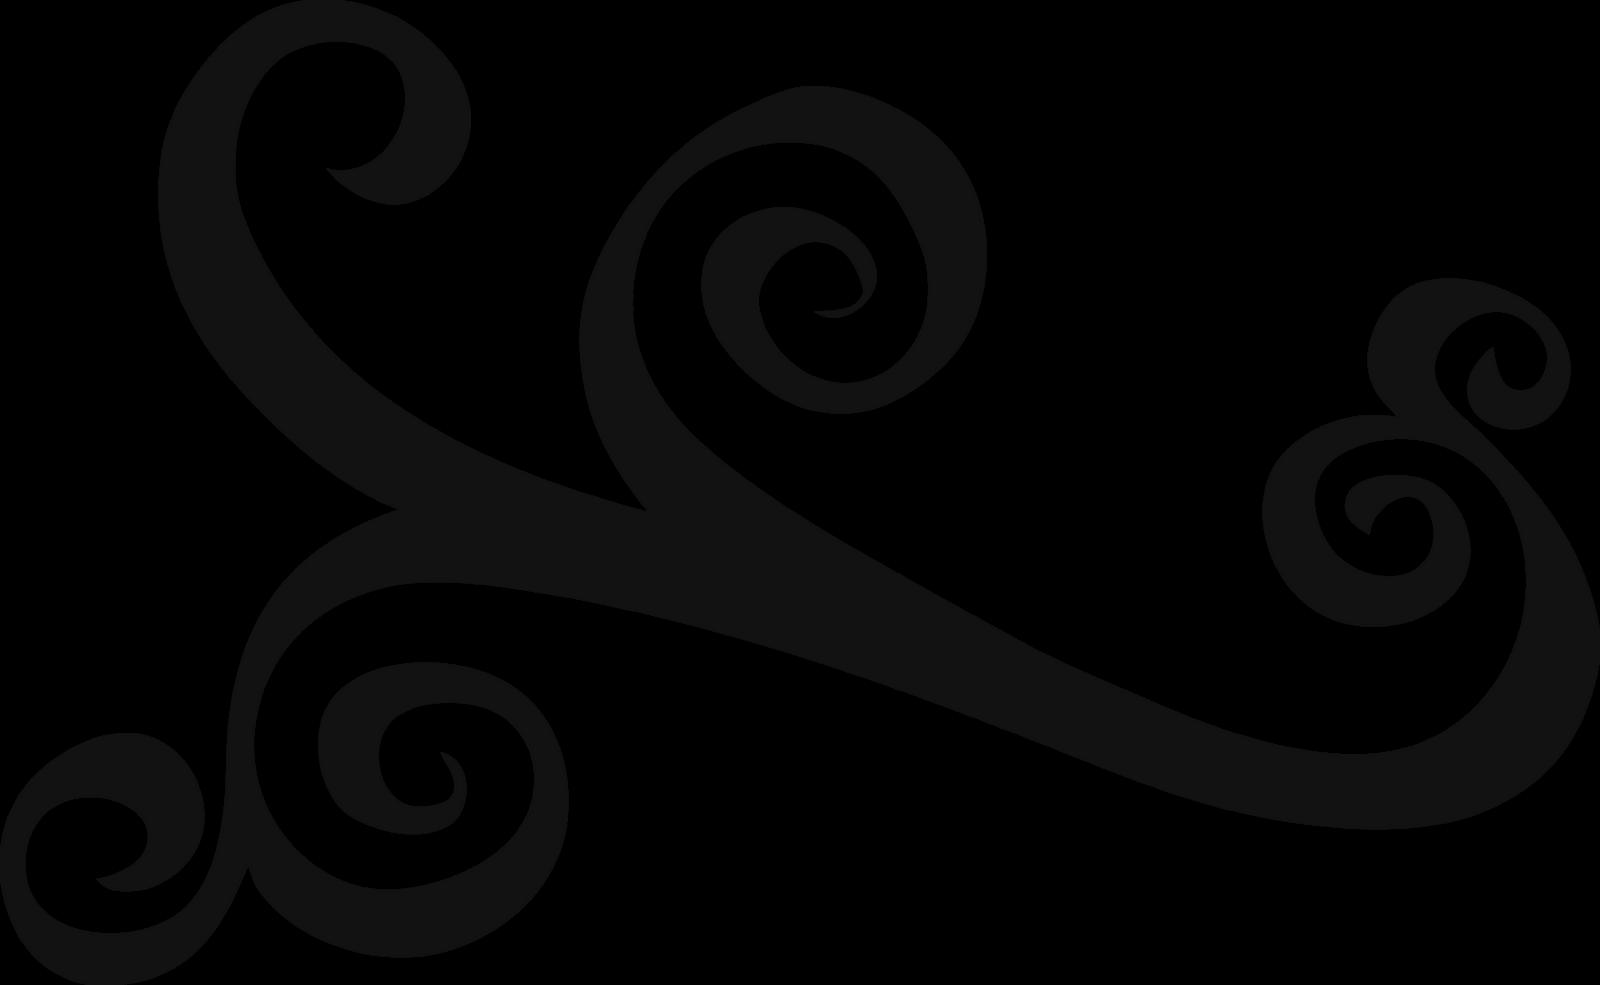 clip art free Simple scroll designs live. Filigree svg.